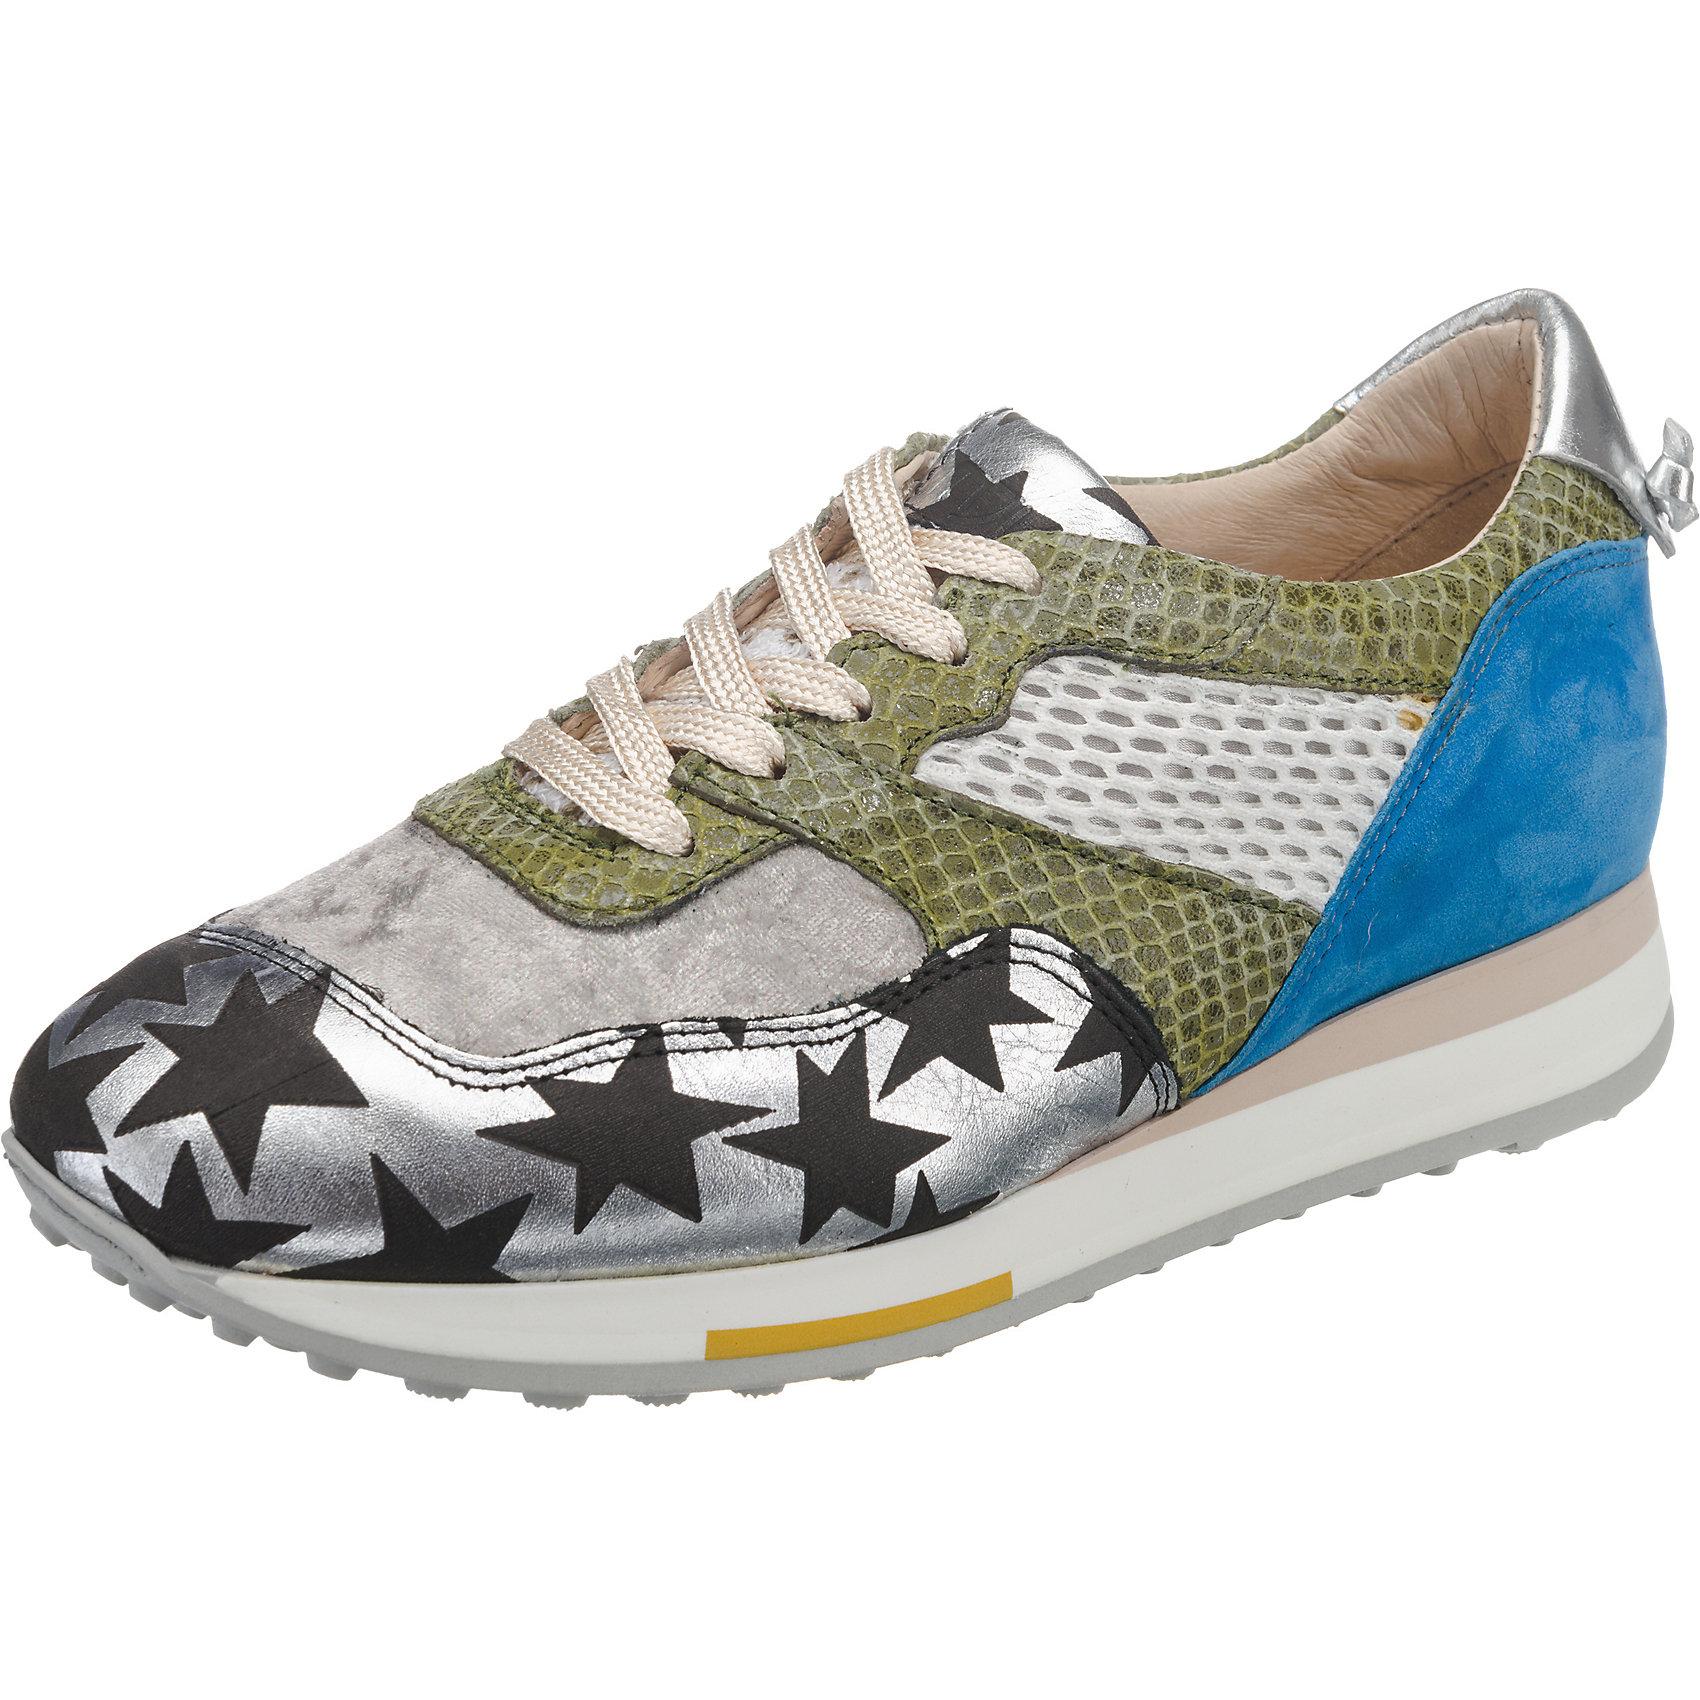 70f5626d942e ... Nike Paul George PG1 Basketball Basketball Basketball Shoes Pure  Platinum Wolf Grey 878627 008 Sz 10 ...